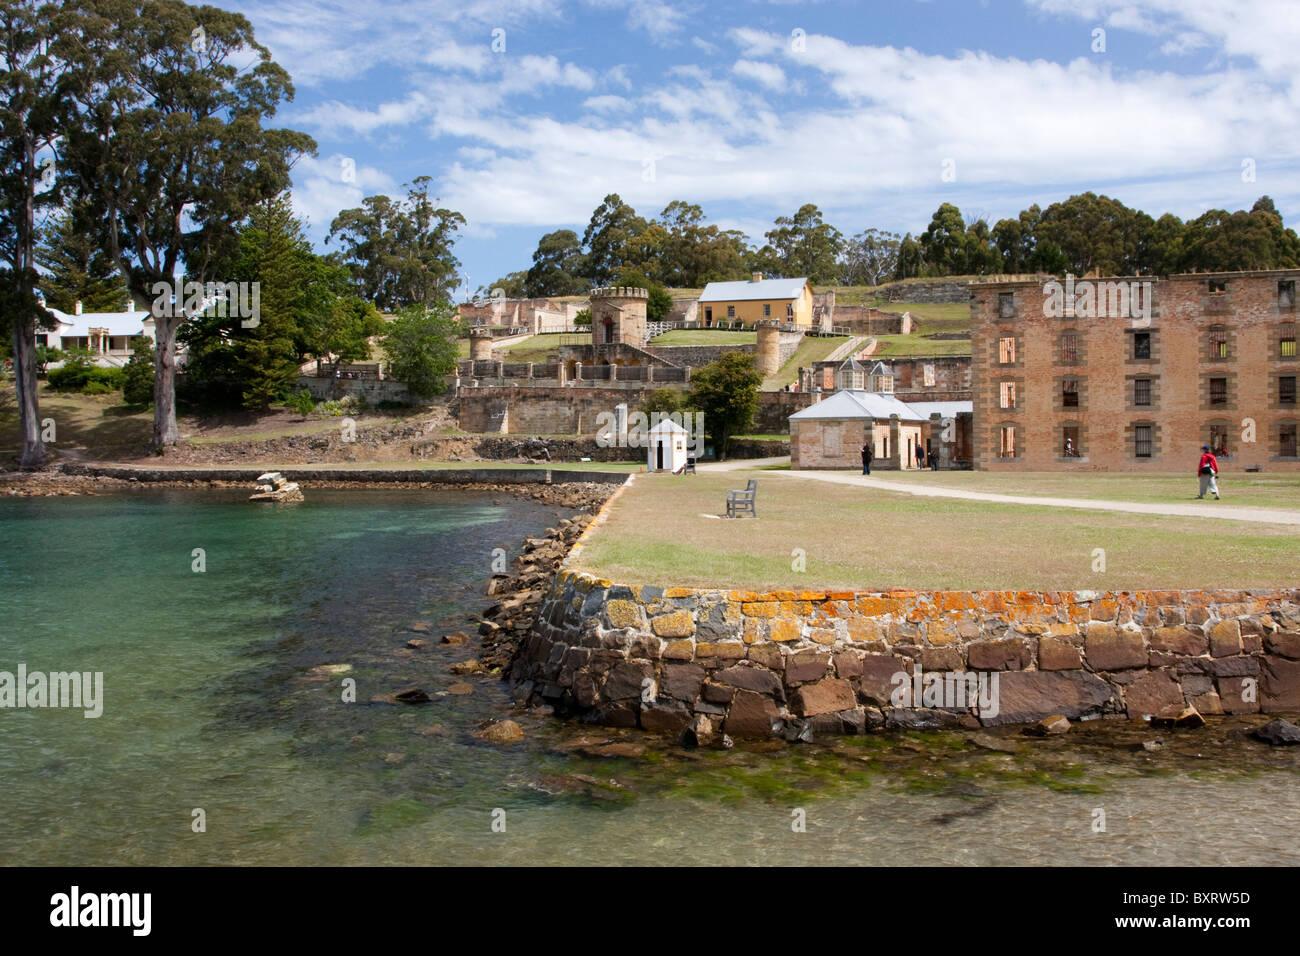 Australia, Tasmania, Tasman Peninsula, Port Arthur, View of buildings of historic site - Stock Image